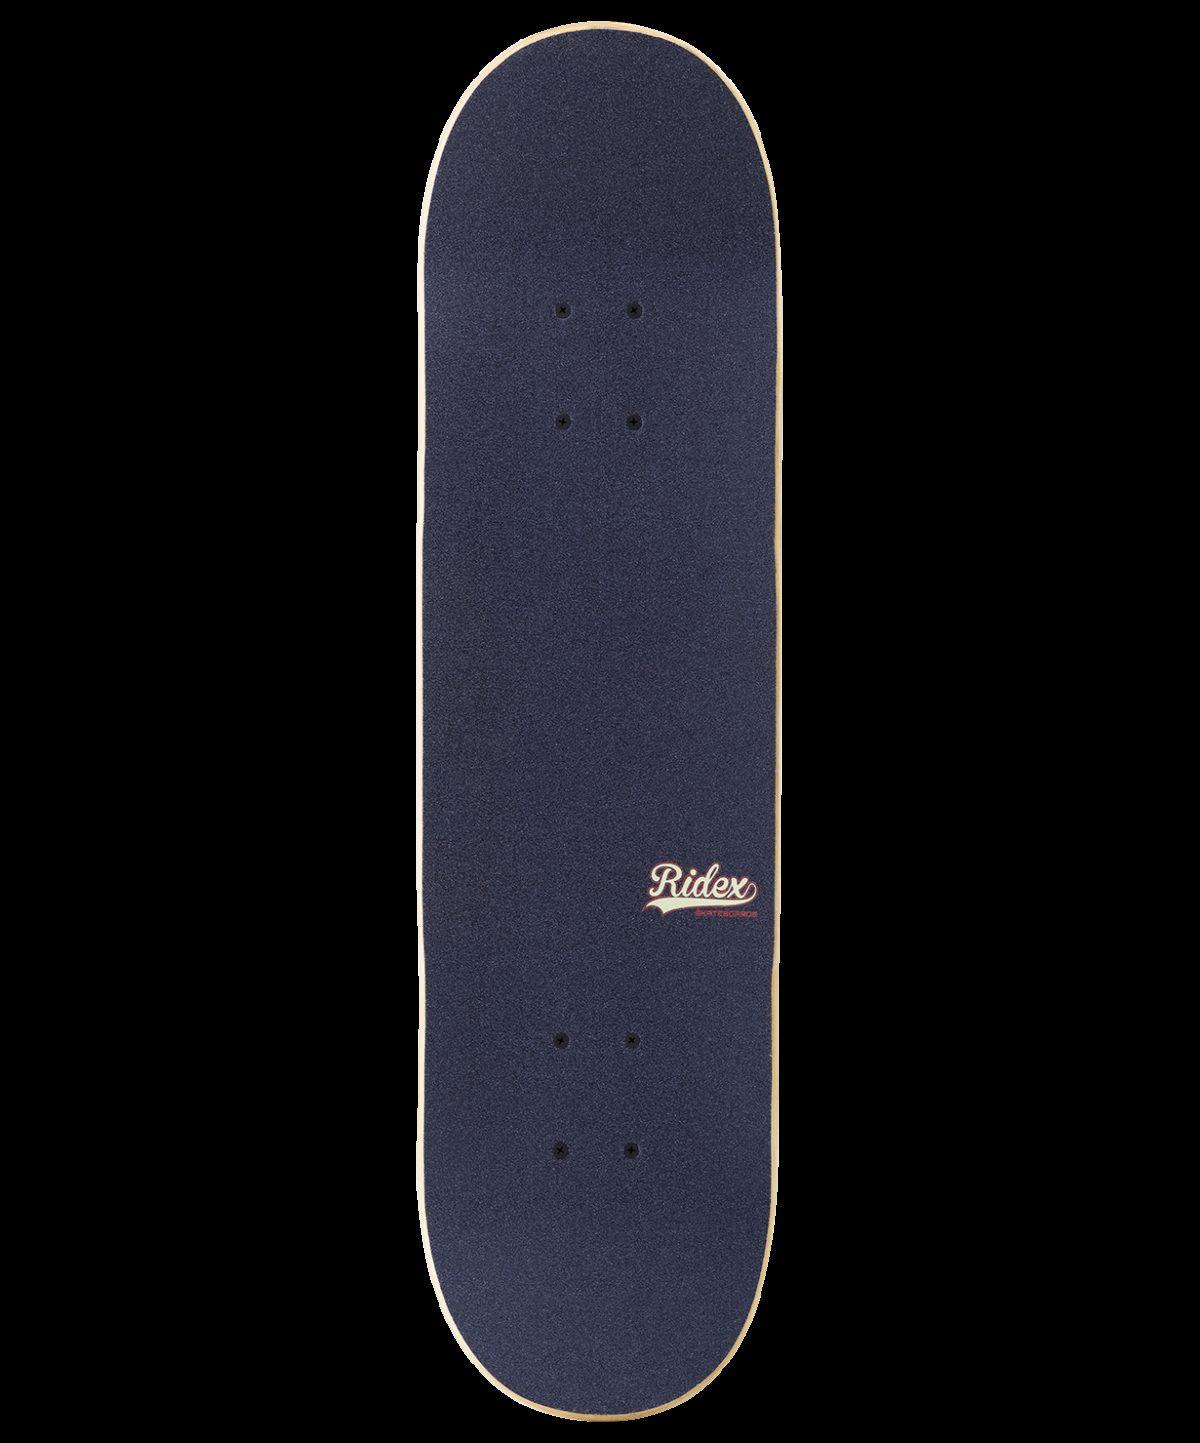 RIDEX скейтборд Addict - 2